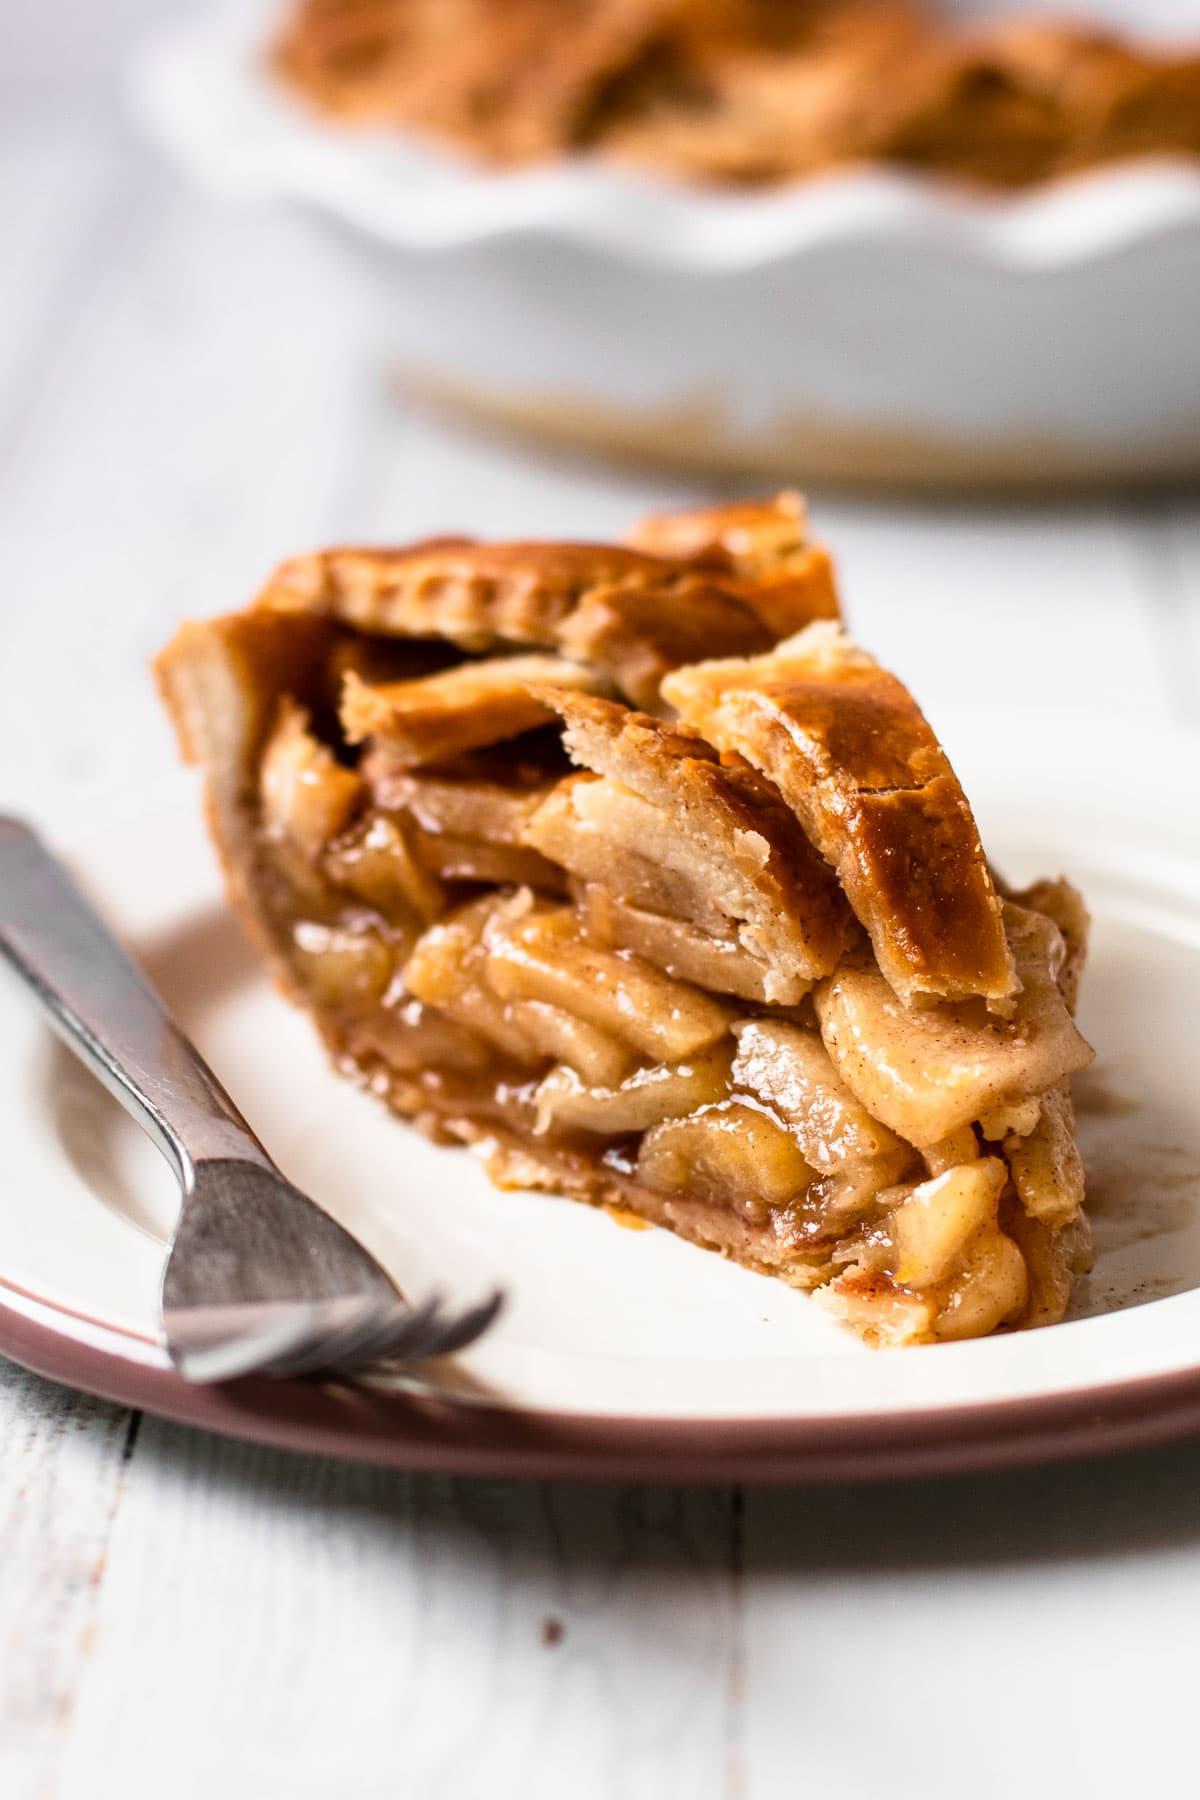 A slice of gluten-free apple pie.